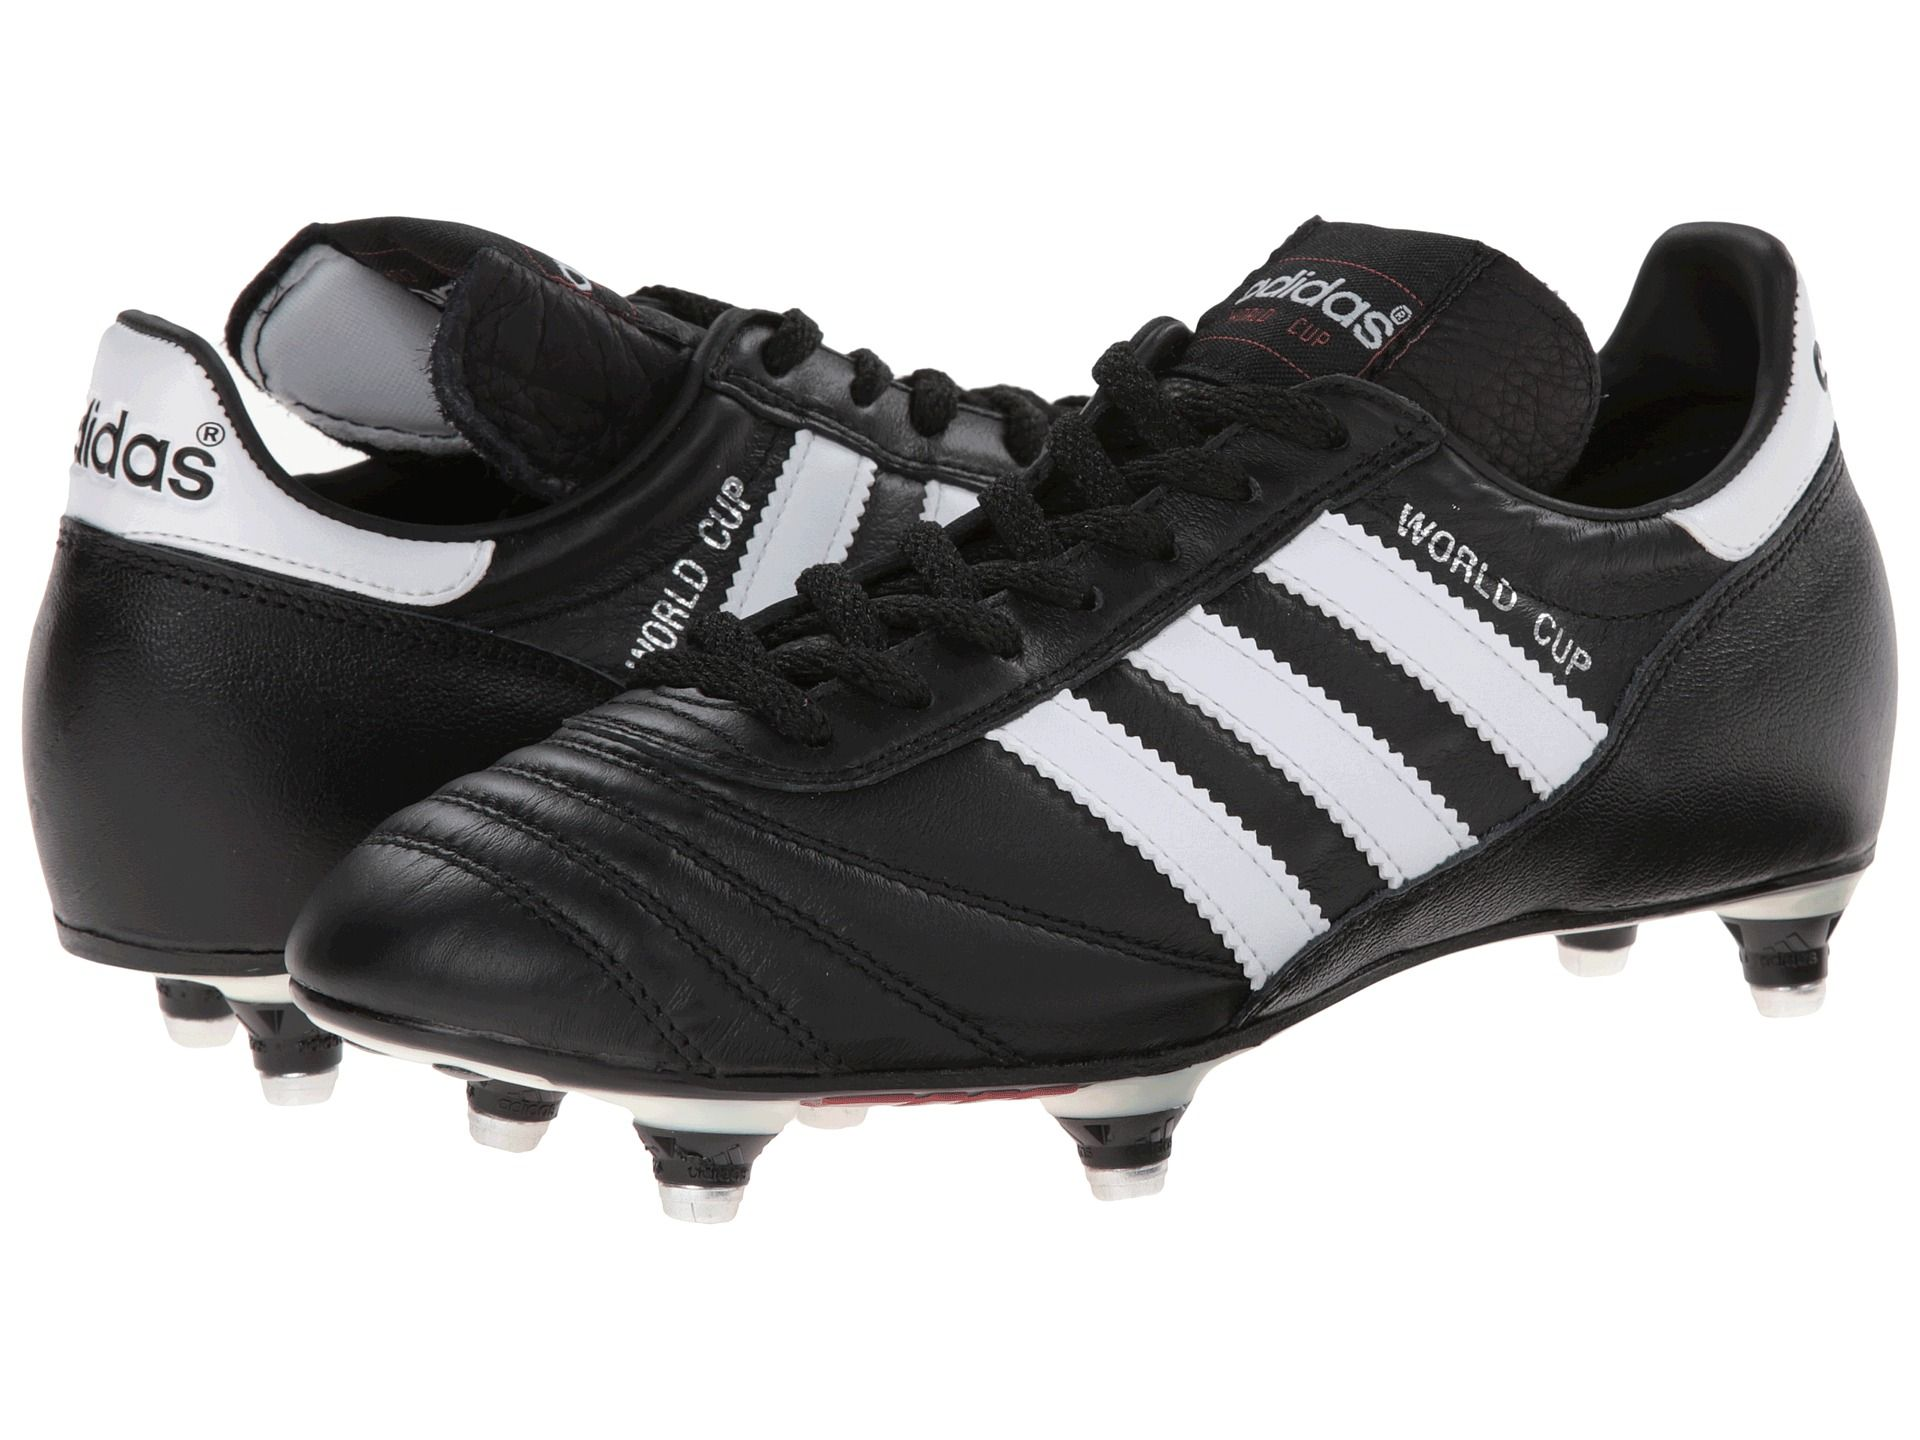 Adidas Original Classic Blanckandwhite Legend 9ine Adidas Adidas Soccer Shoes Samba Shoes